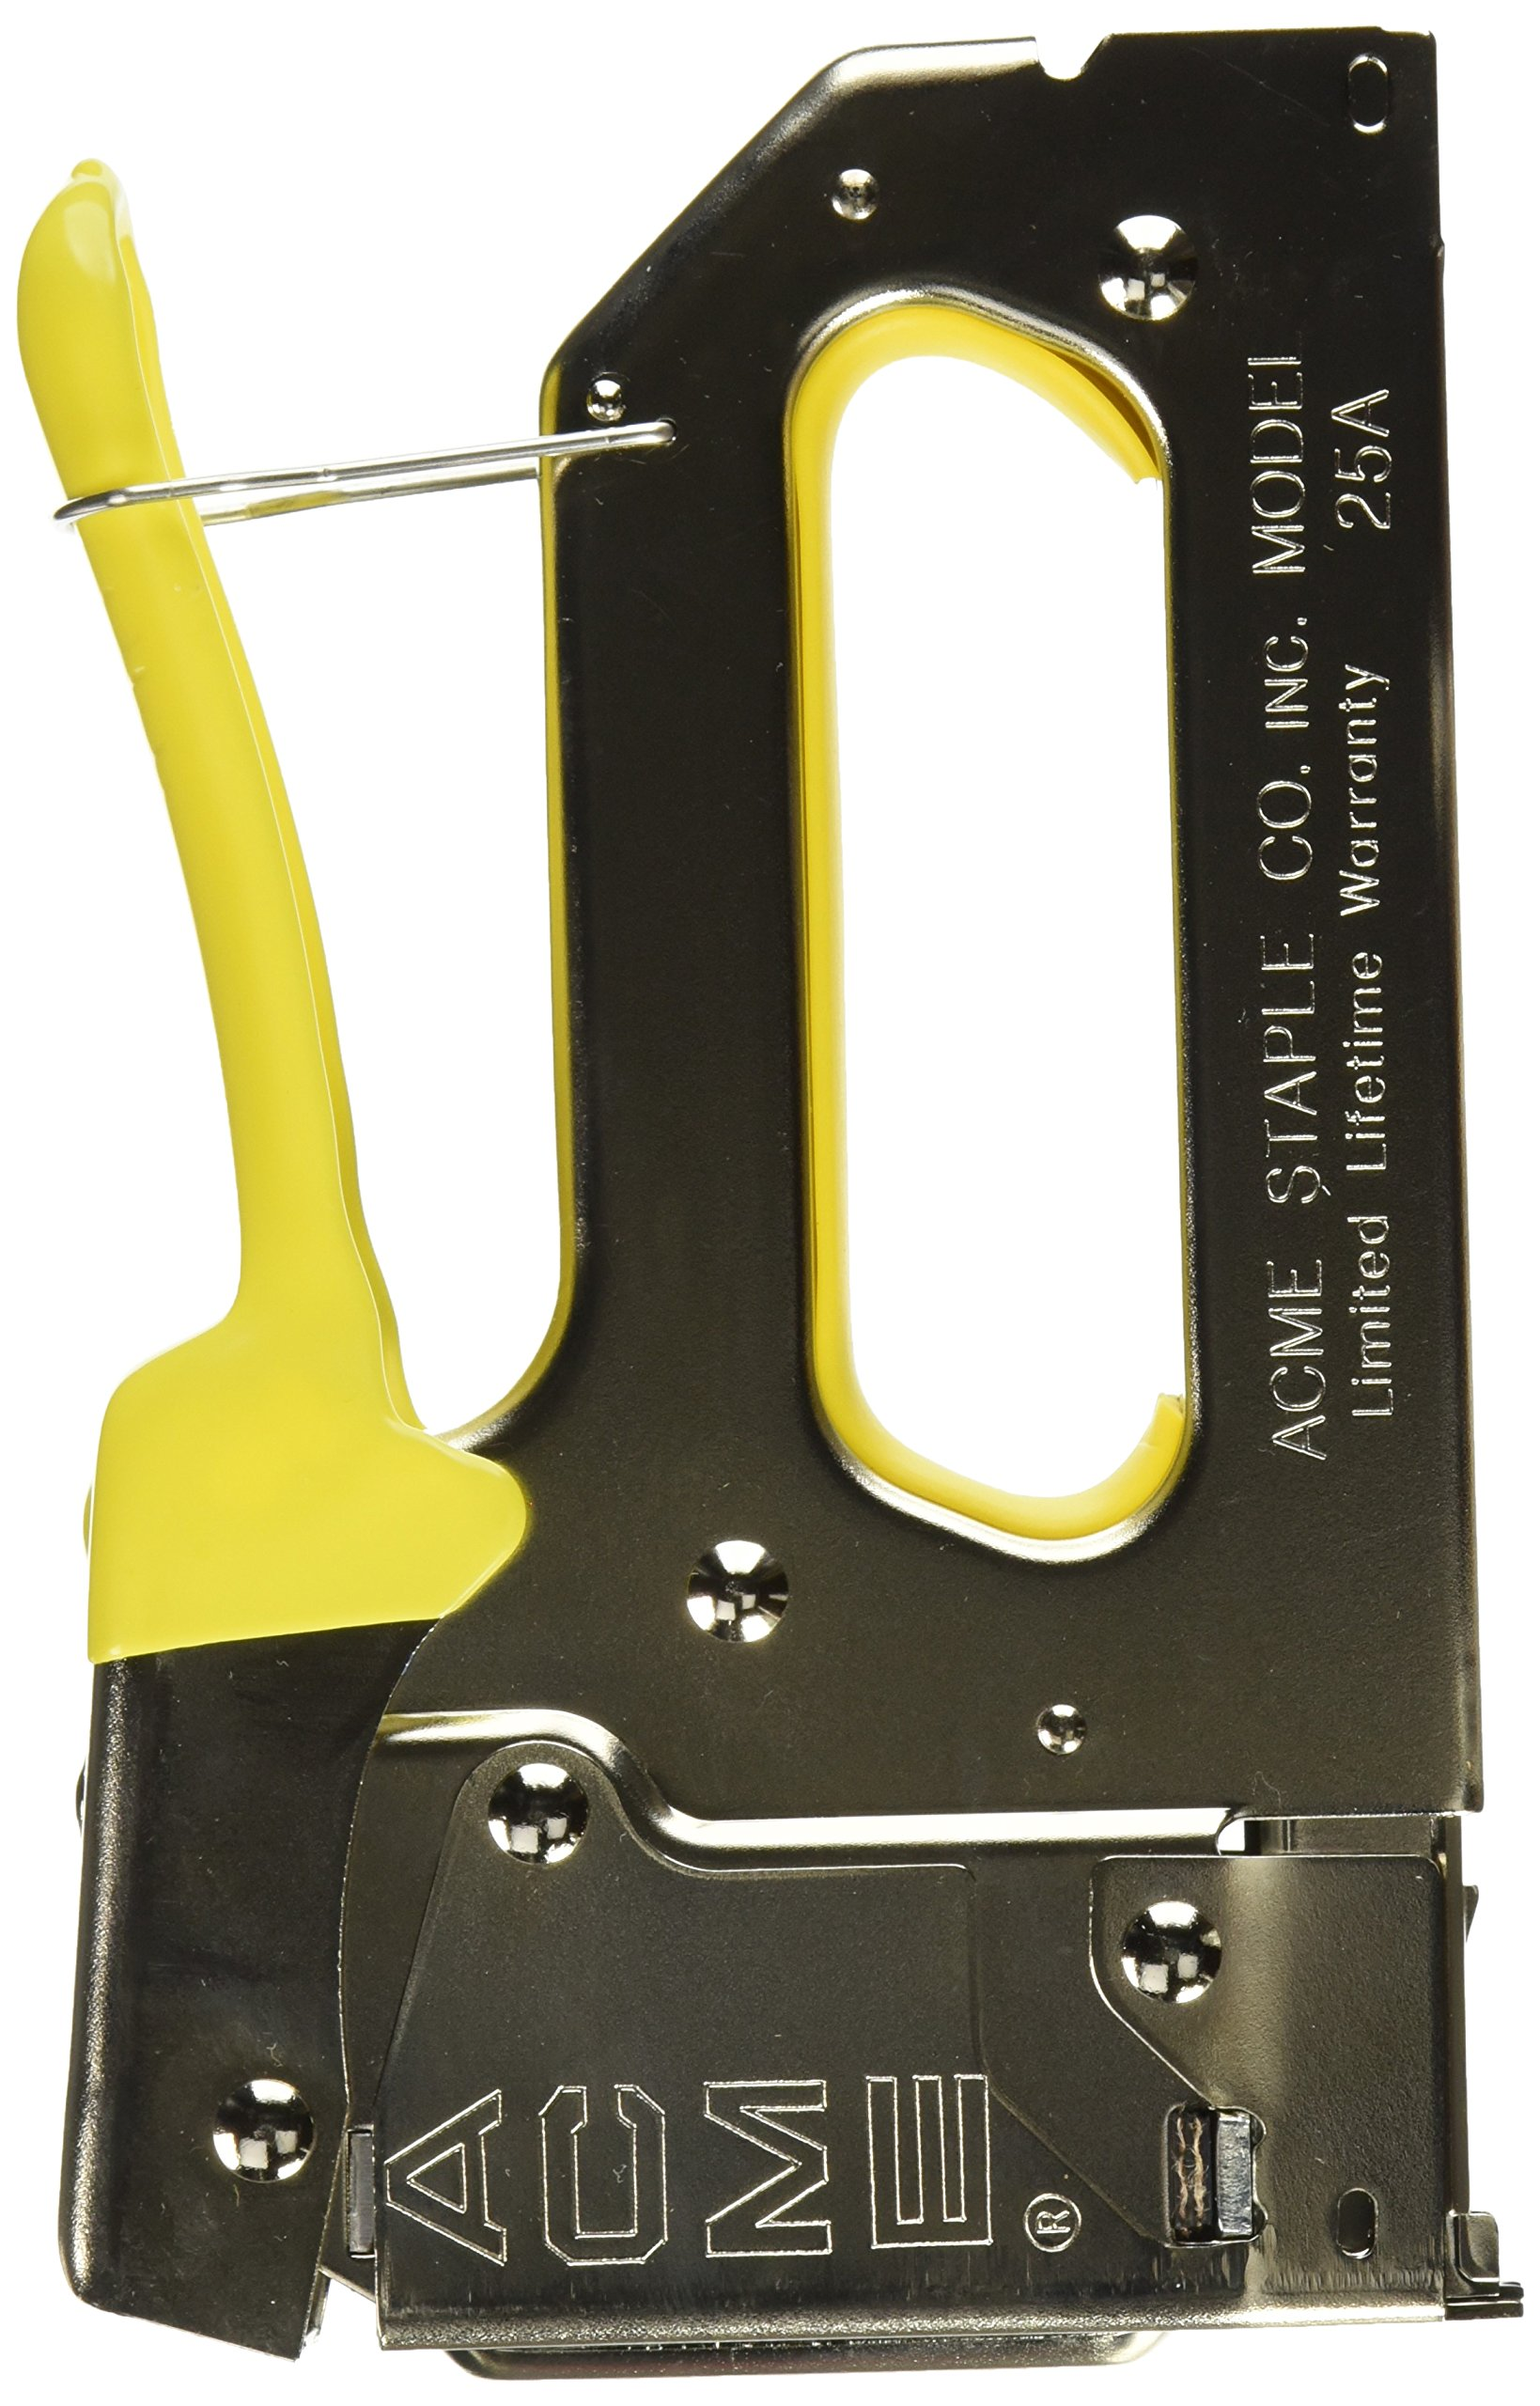 Acme Staple 654025B 25A Staple Gun with Bottom-Load Magazine Crown, 1/4''